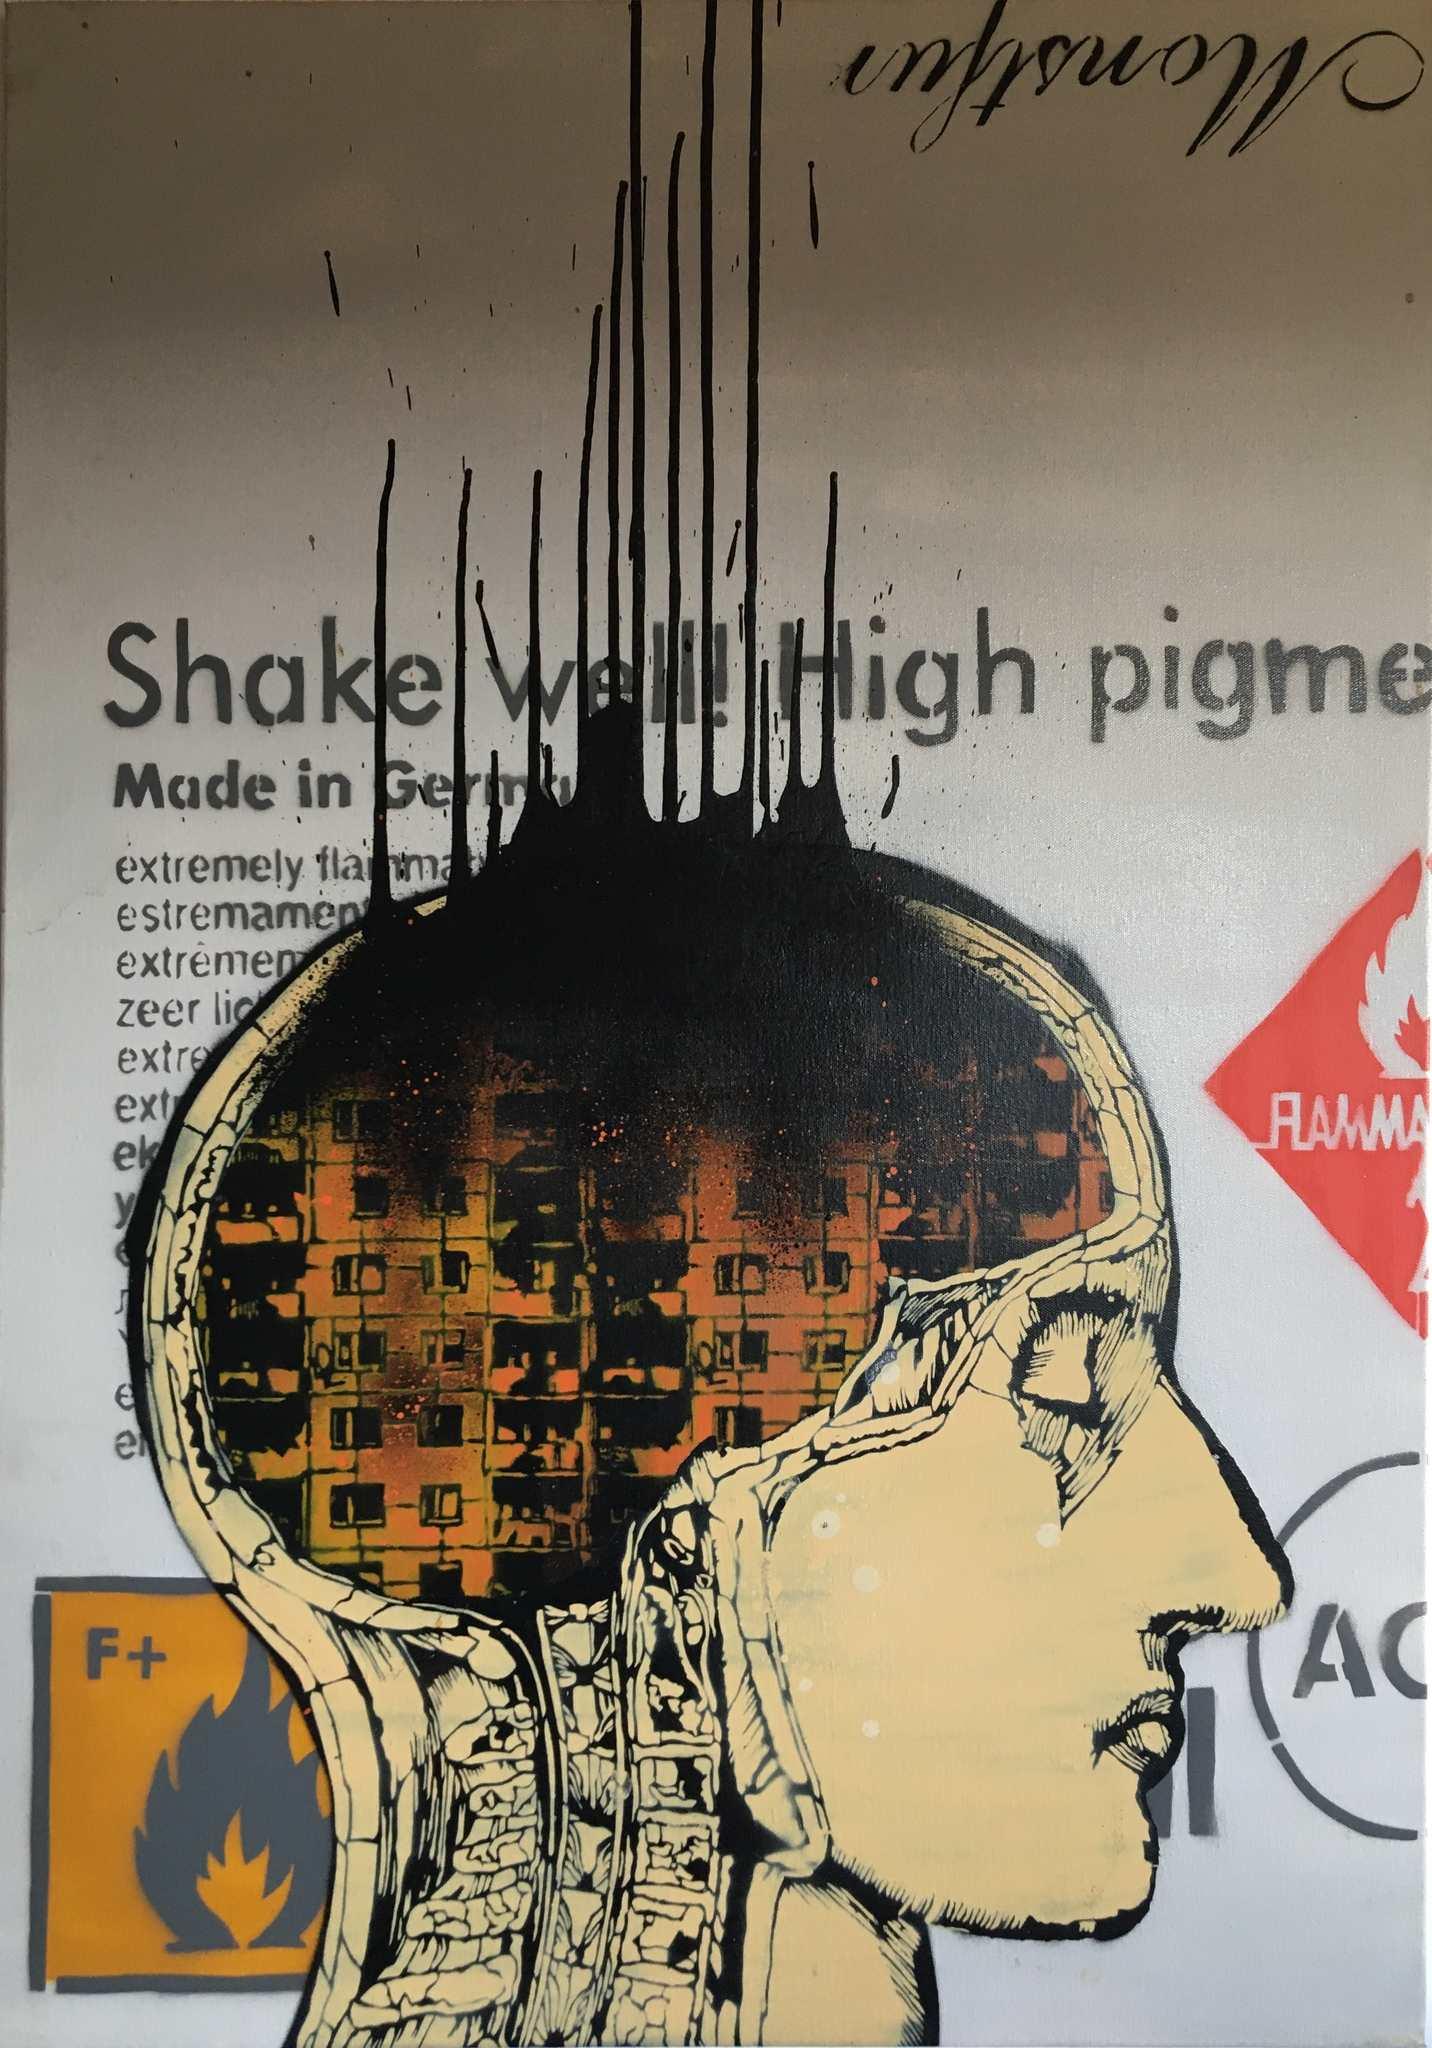 Shake well! High pigmentation!, 2008